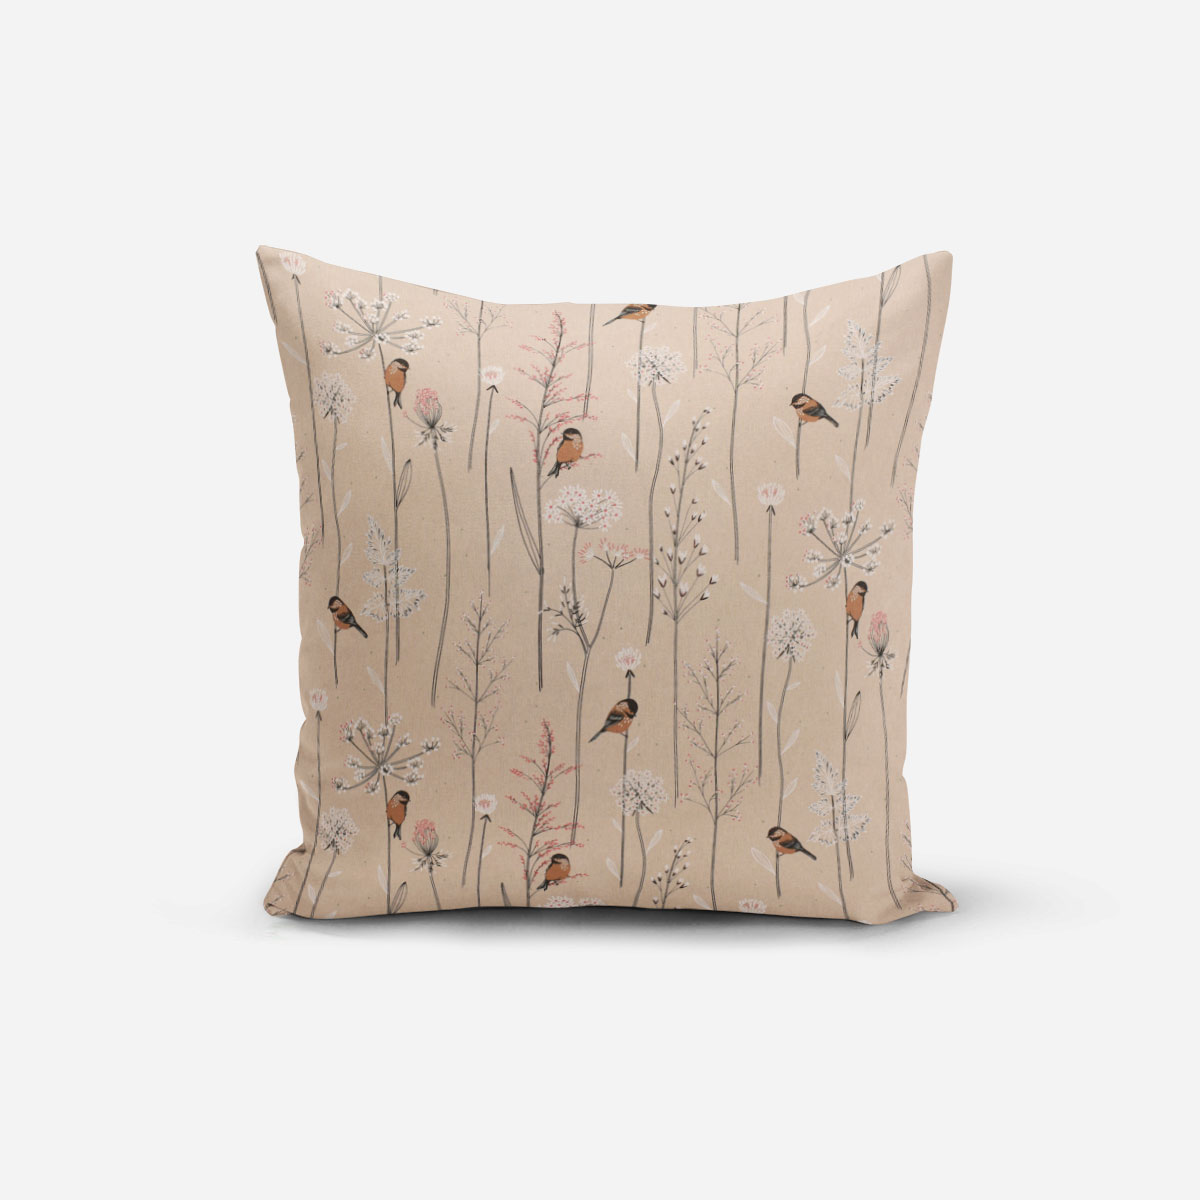 SCHÖNER LEBEN. Kissenhülle Leinenlook Soft Branch Blüten Gräser Vögel natur rosa verschiedene Größen